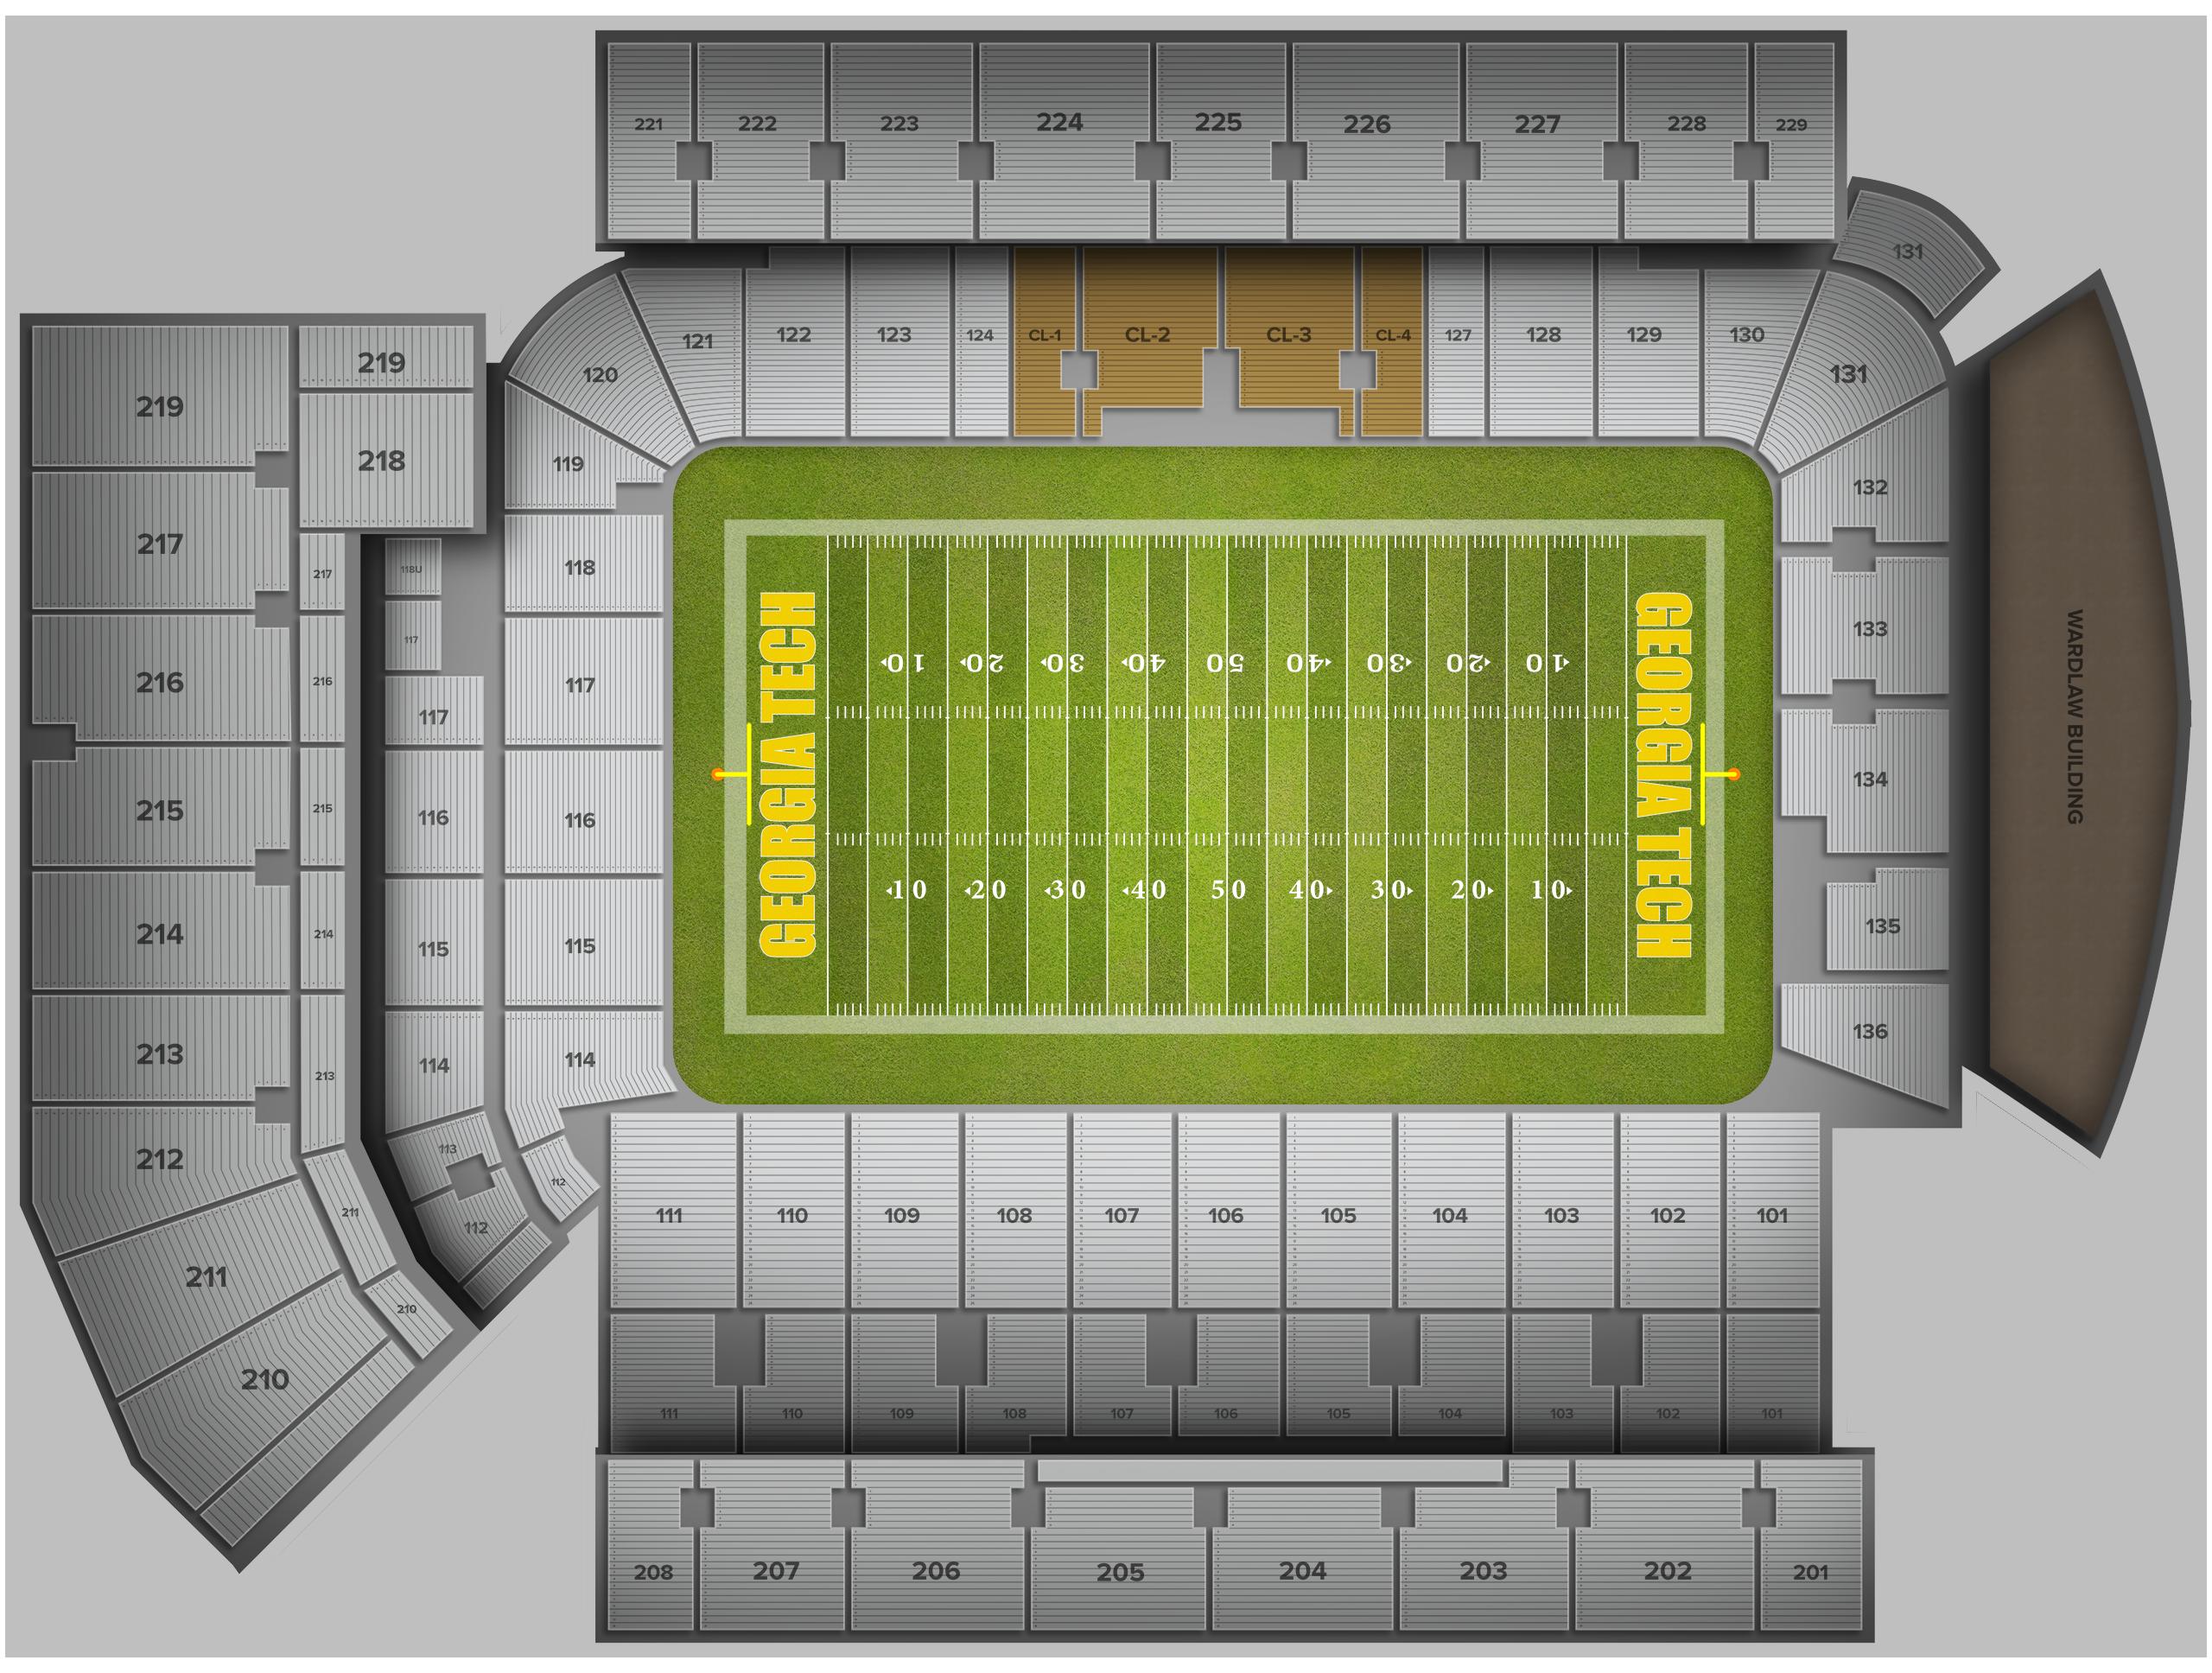 Bobby Dodd Stadium Tickets